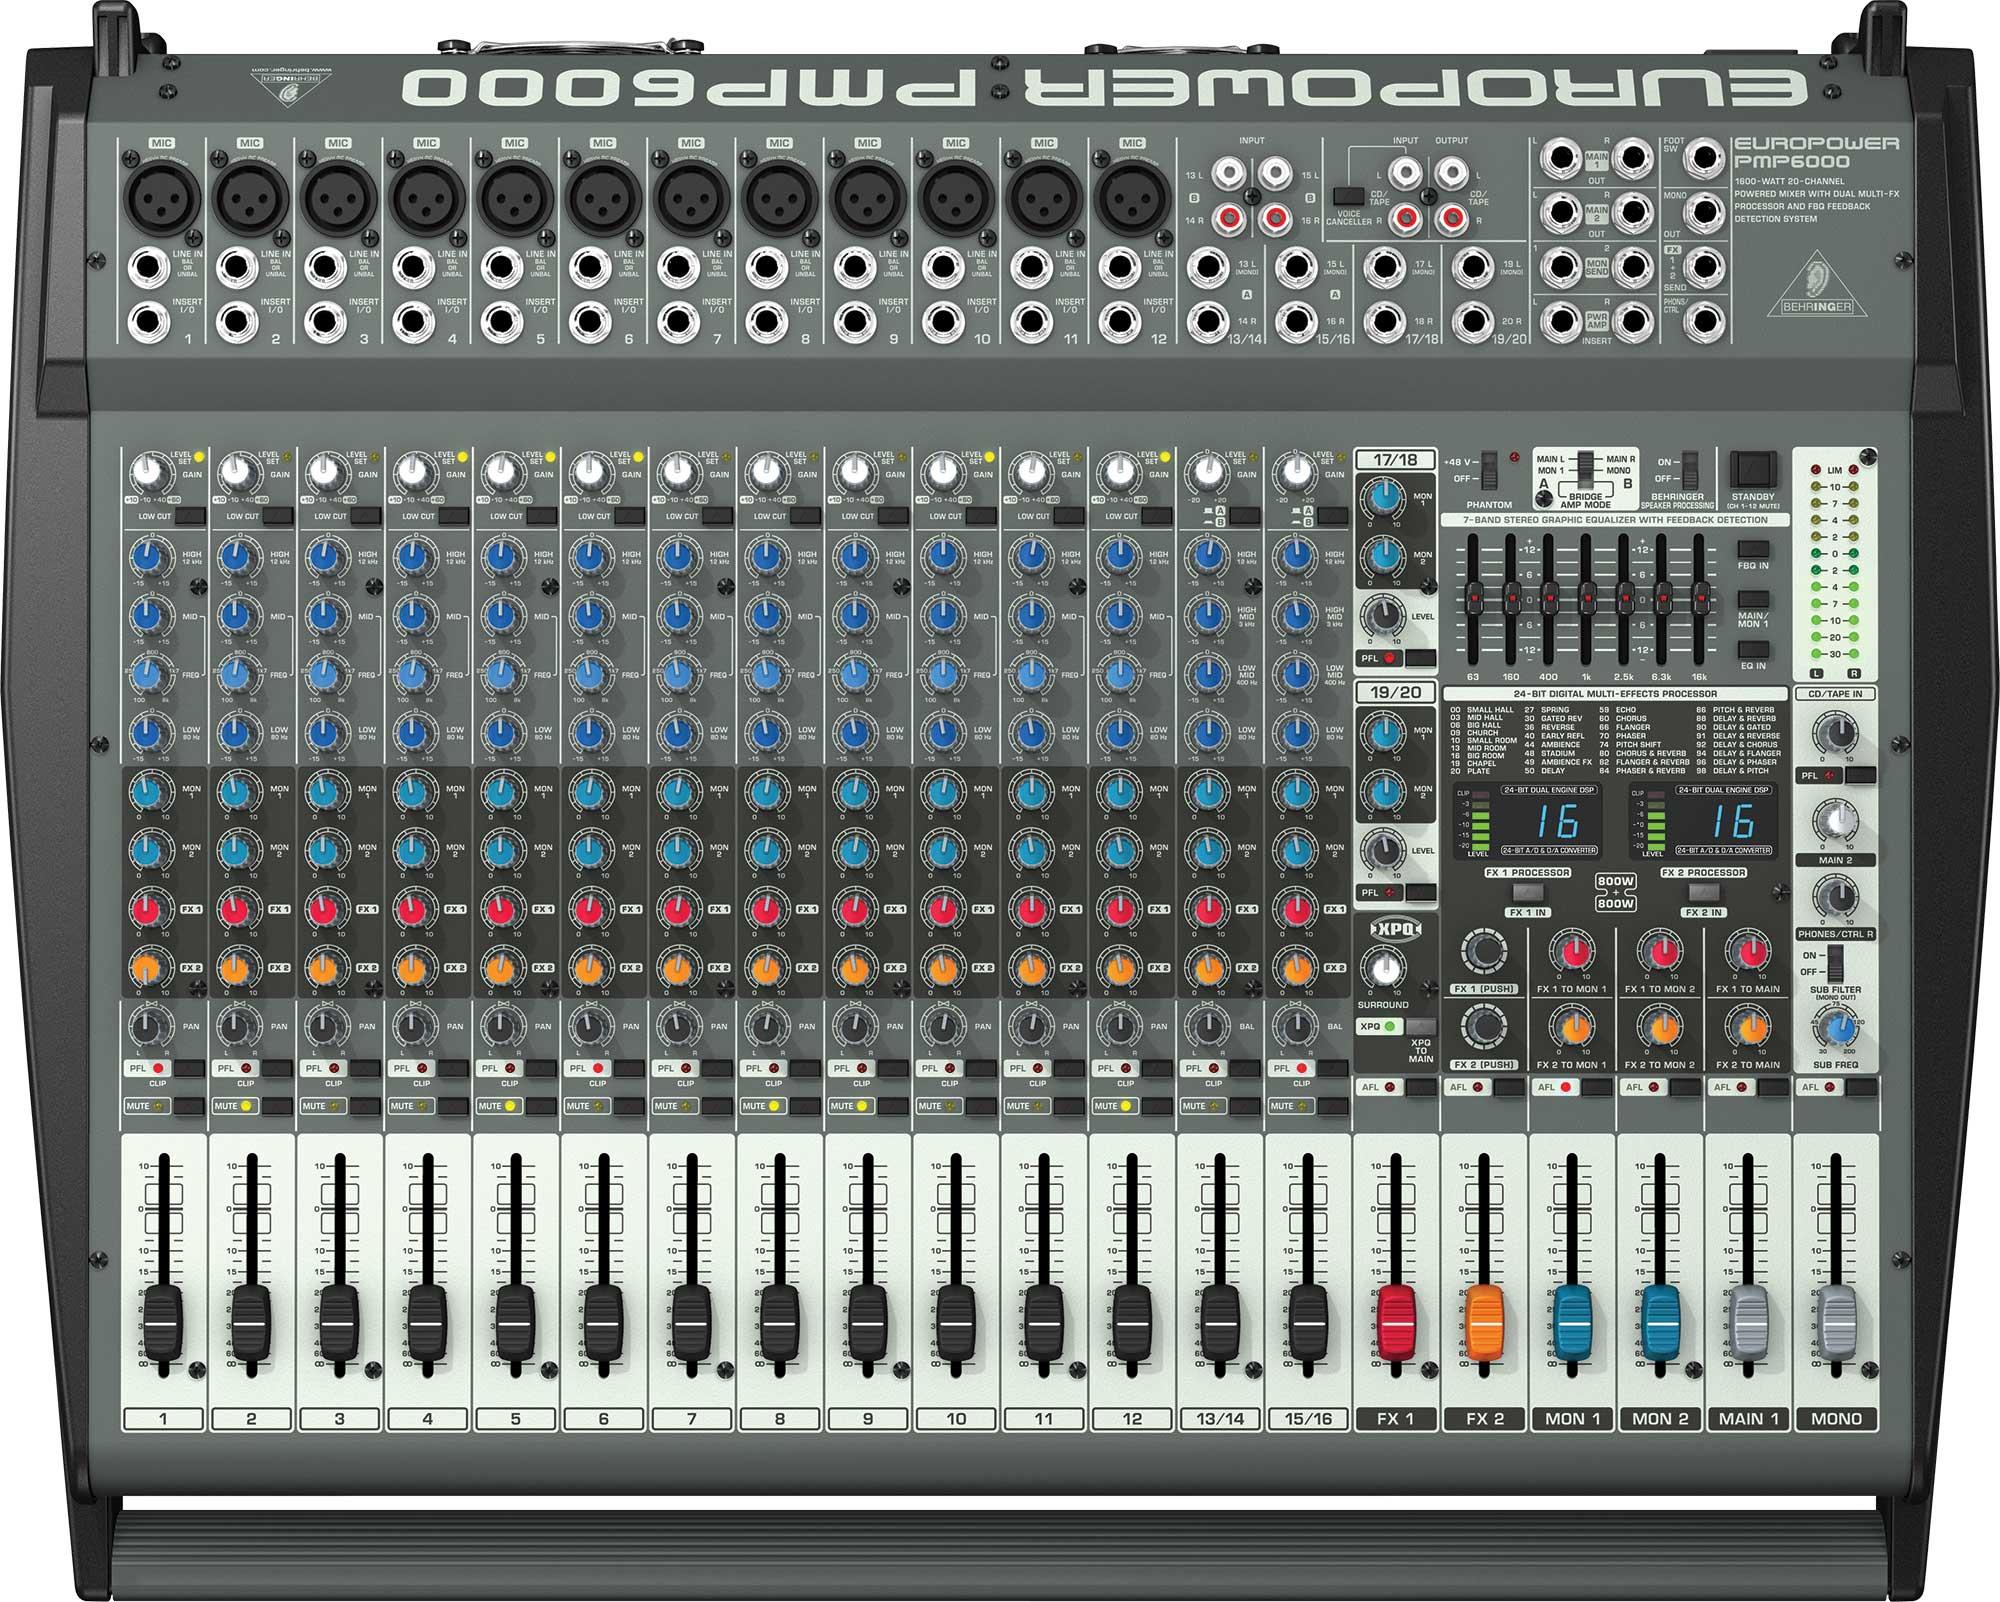 Power Mixer, 20 Channel (12 Mono + 4 Stereo), 2 x 800W Stereo or Dual Mono, 1600W Bridged Mono